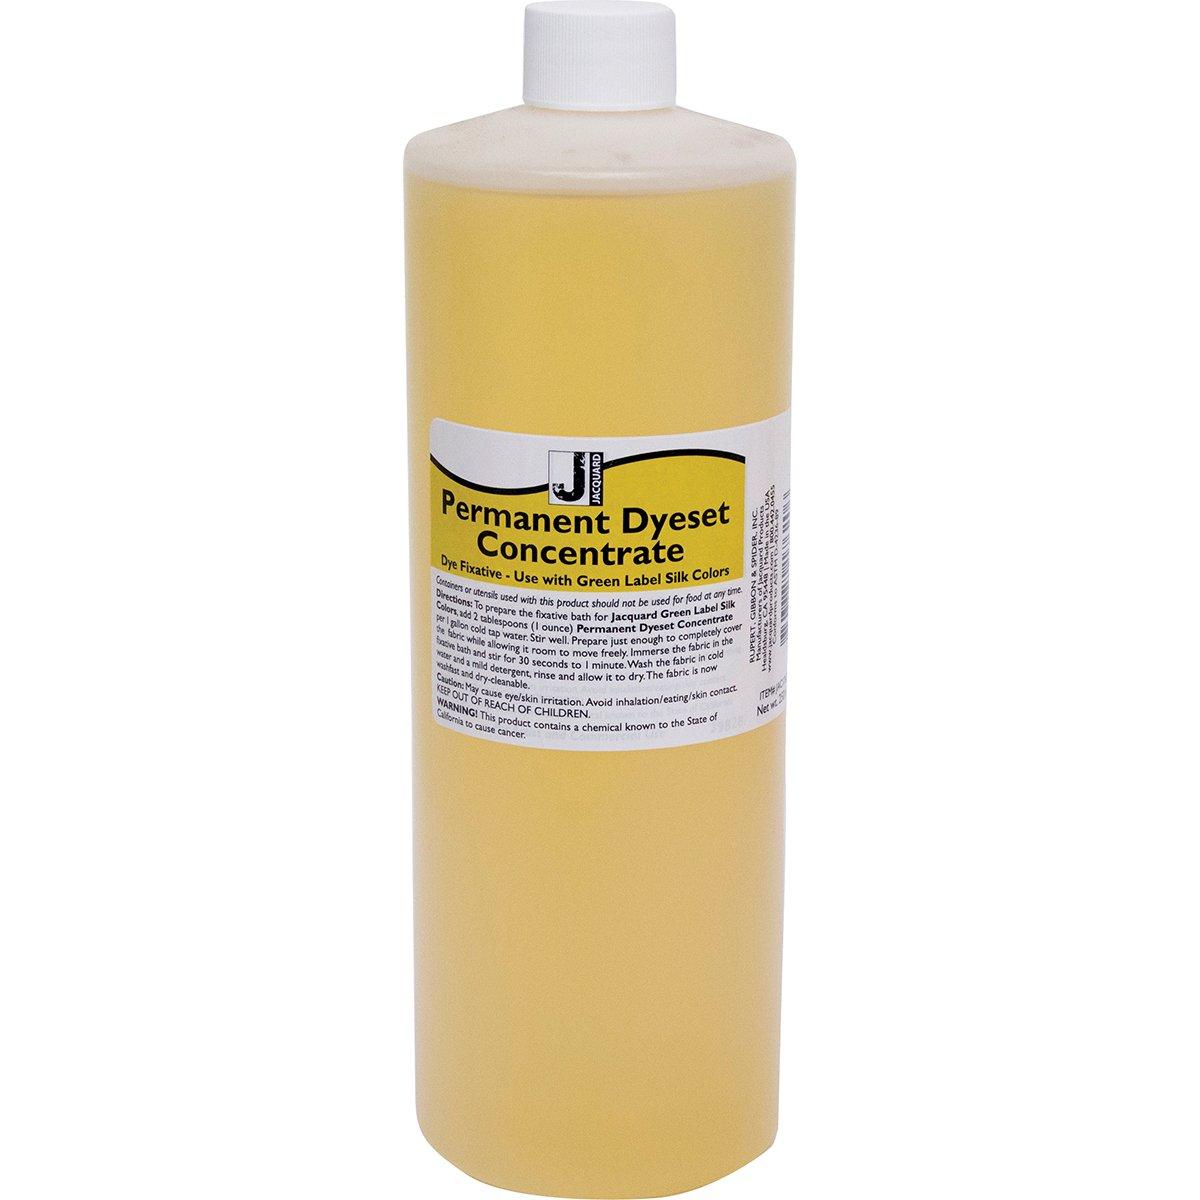 Jacquard Products JAC1762 Permanent Dyeset Concentrate, 250ml